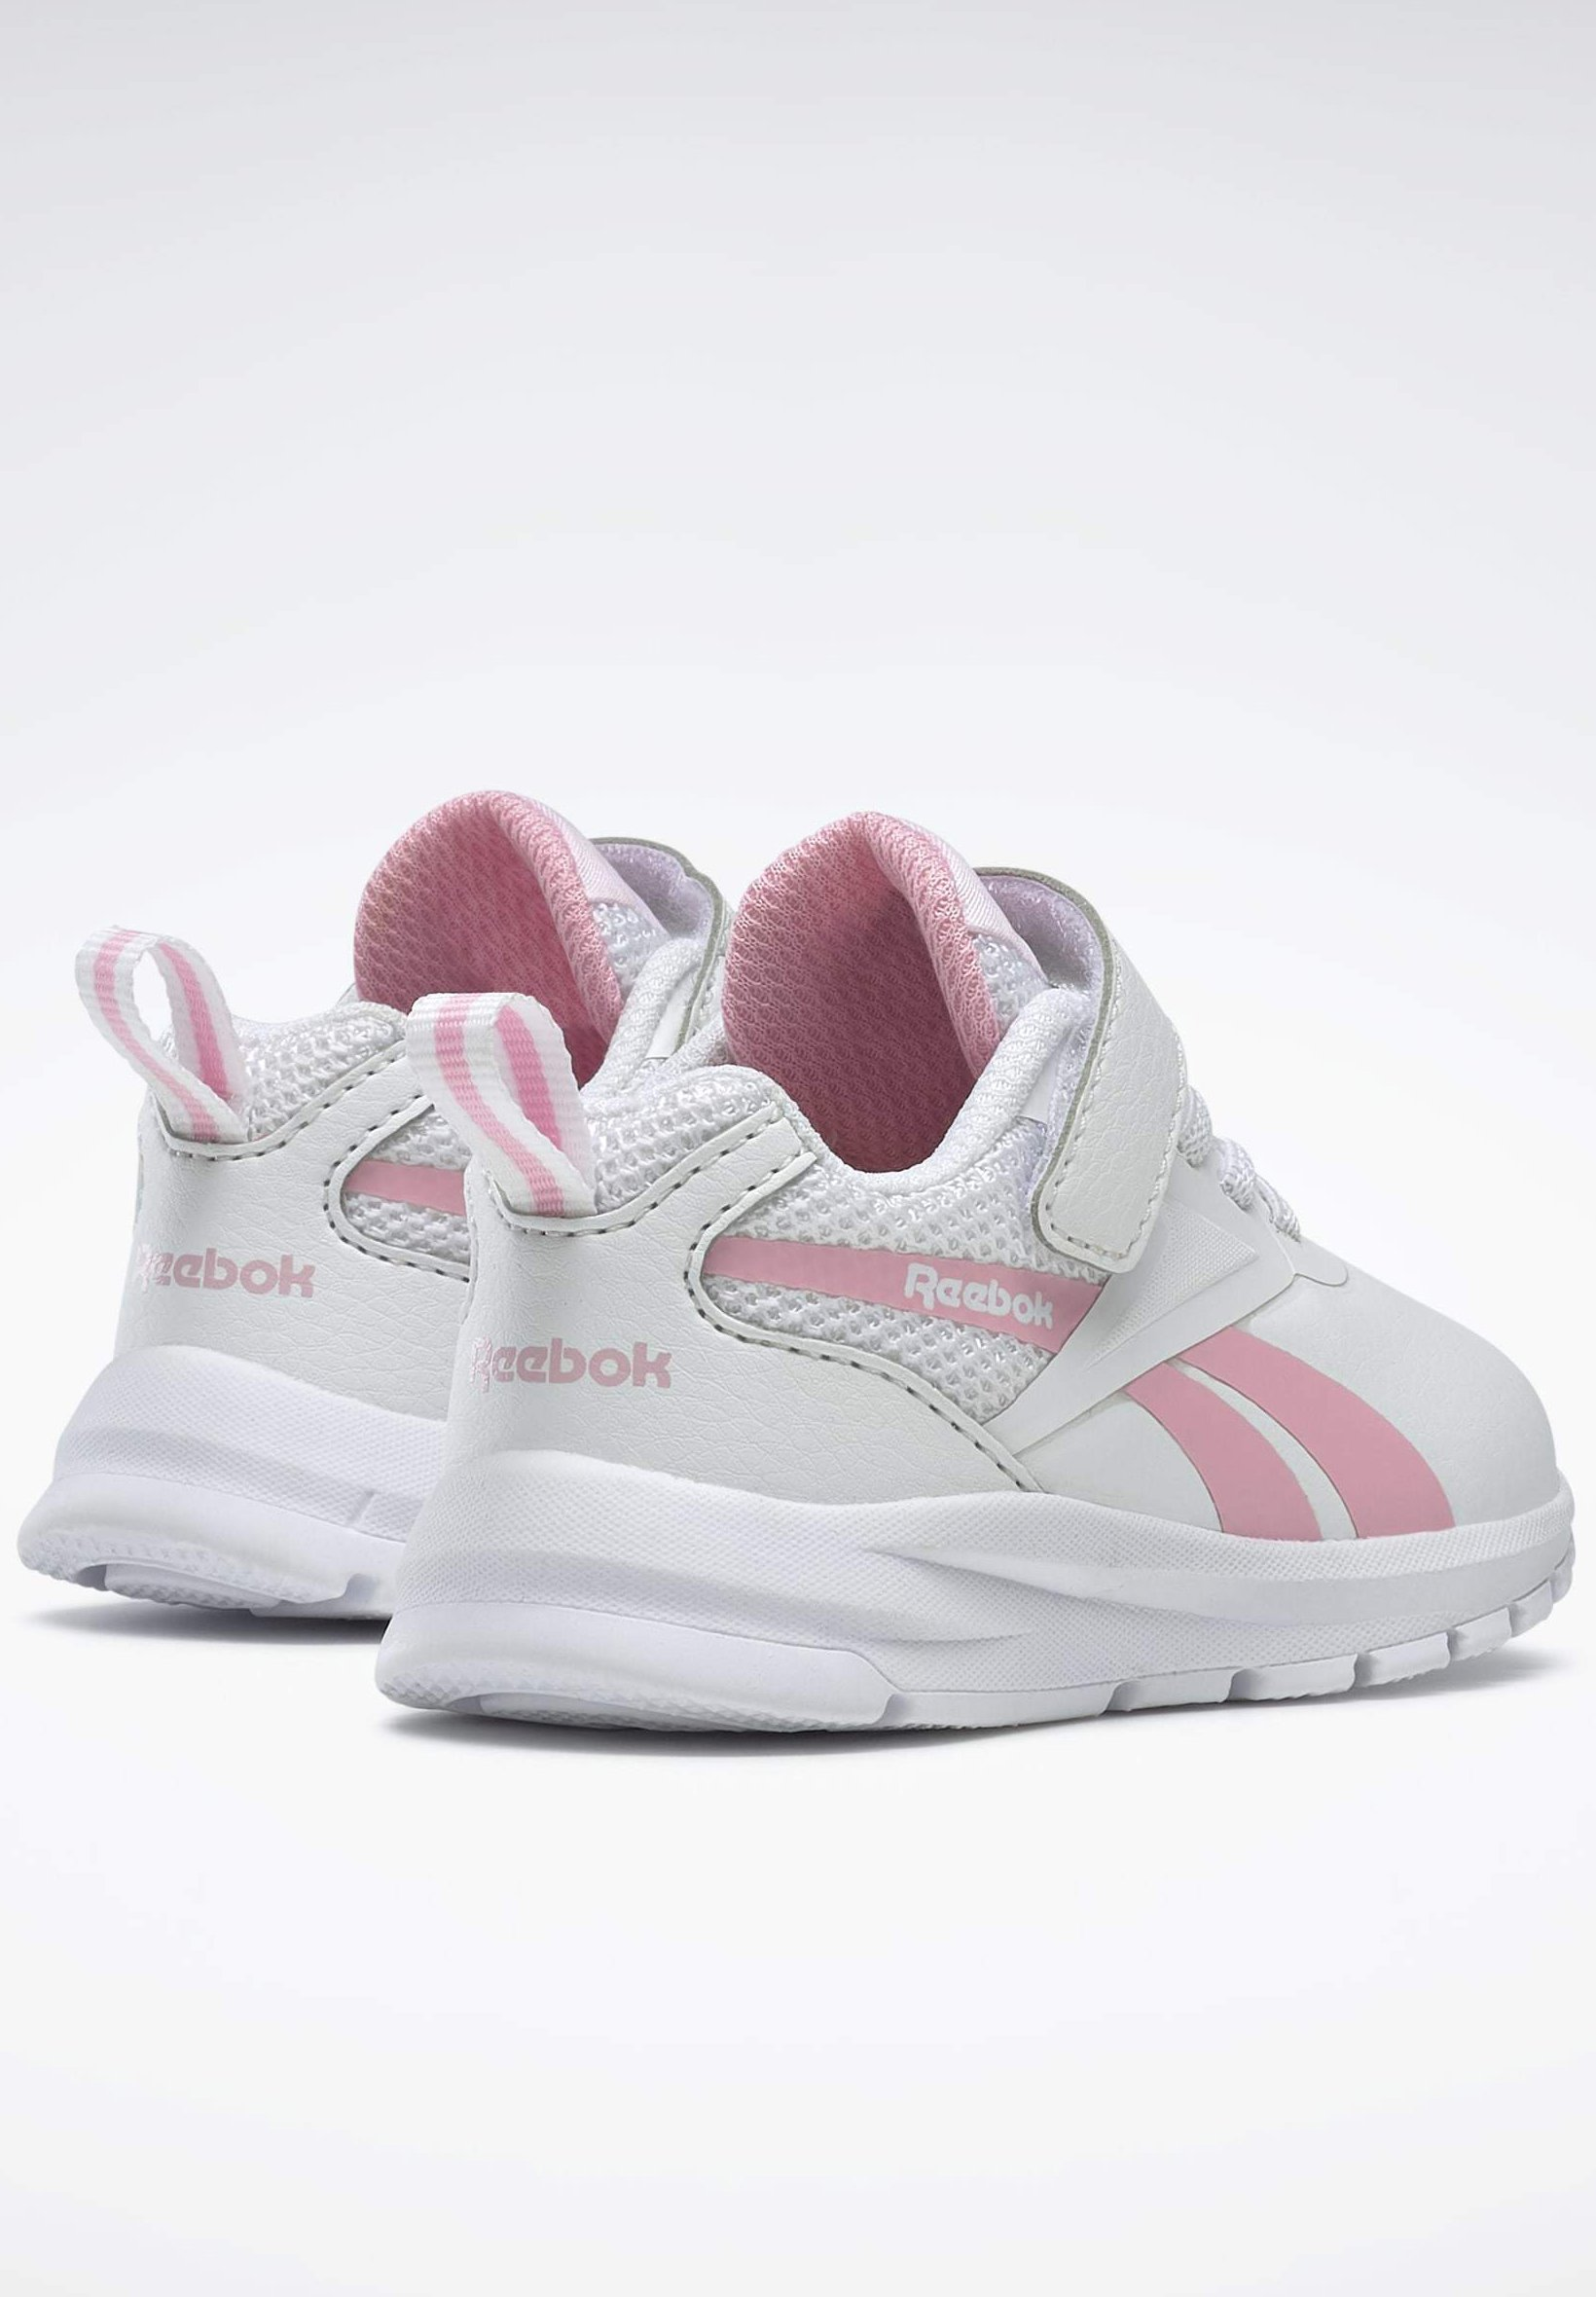 Reebok REEBOK RUSH RUNNER 3 SHOES Sneaker low white